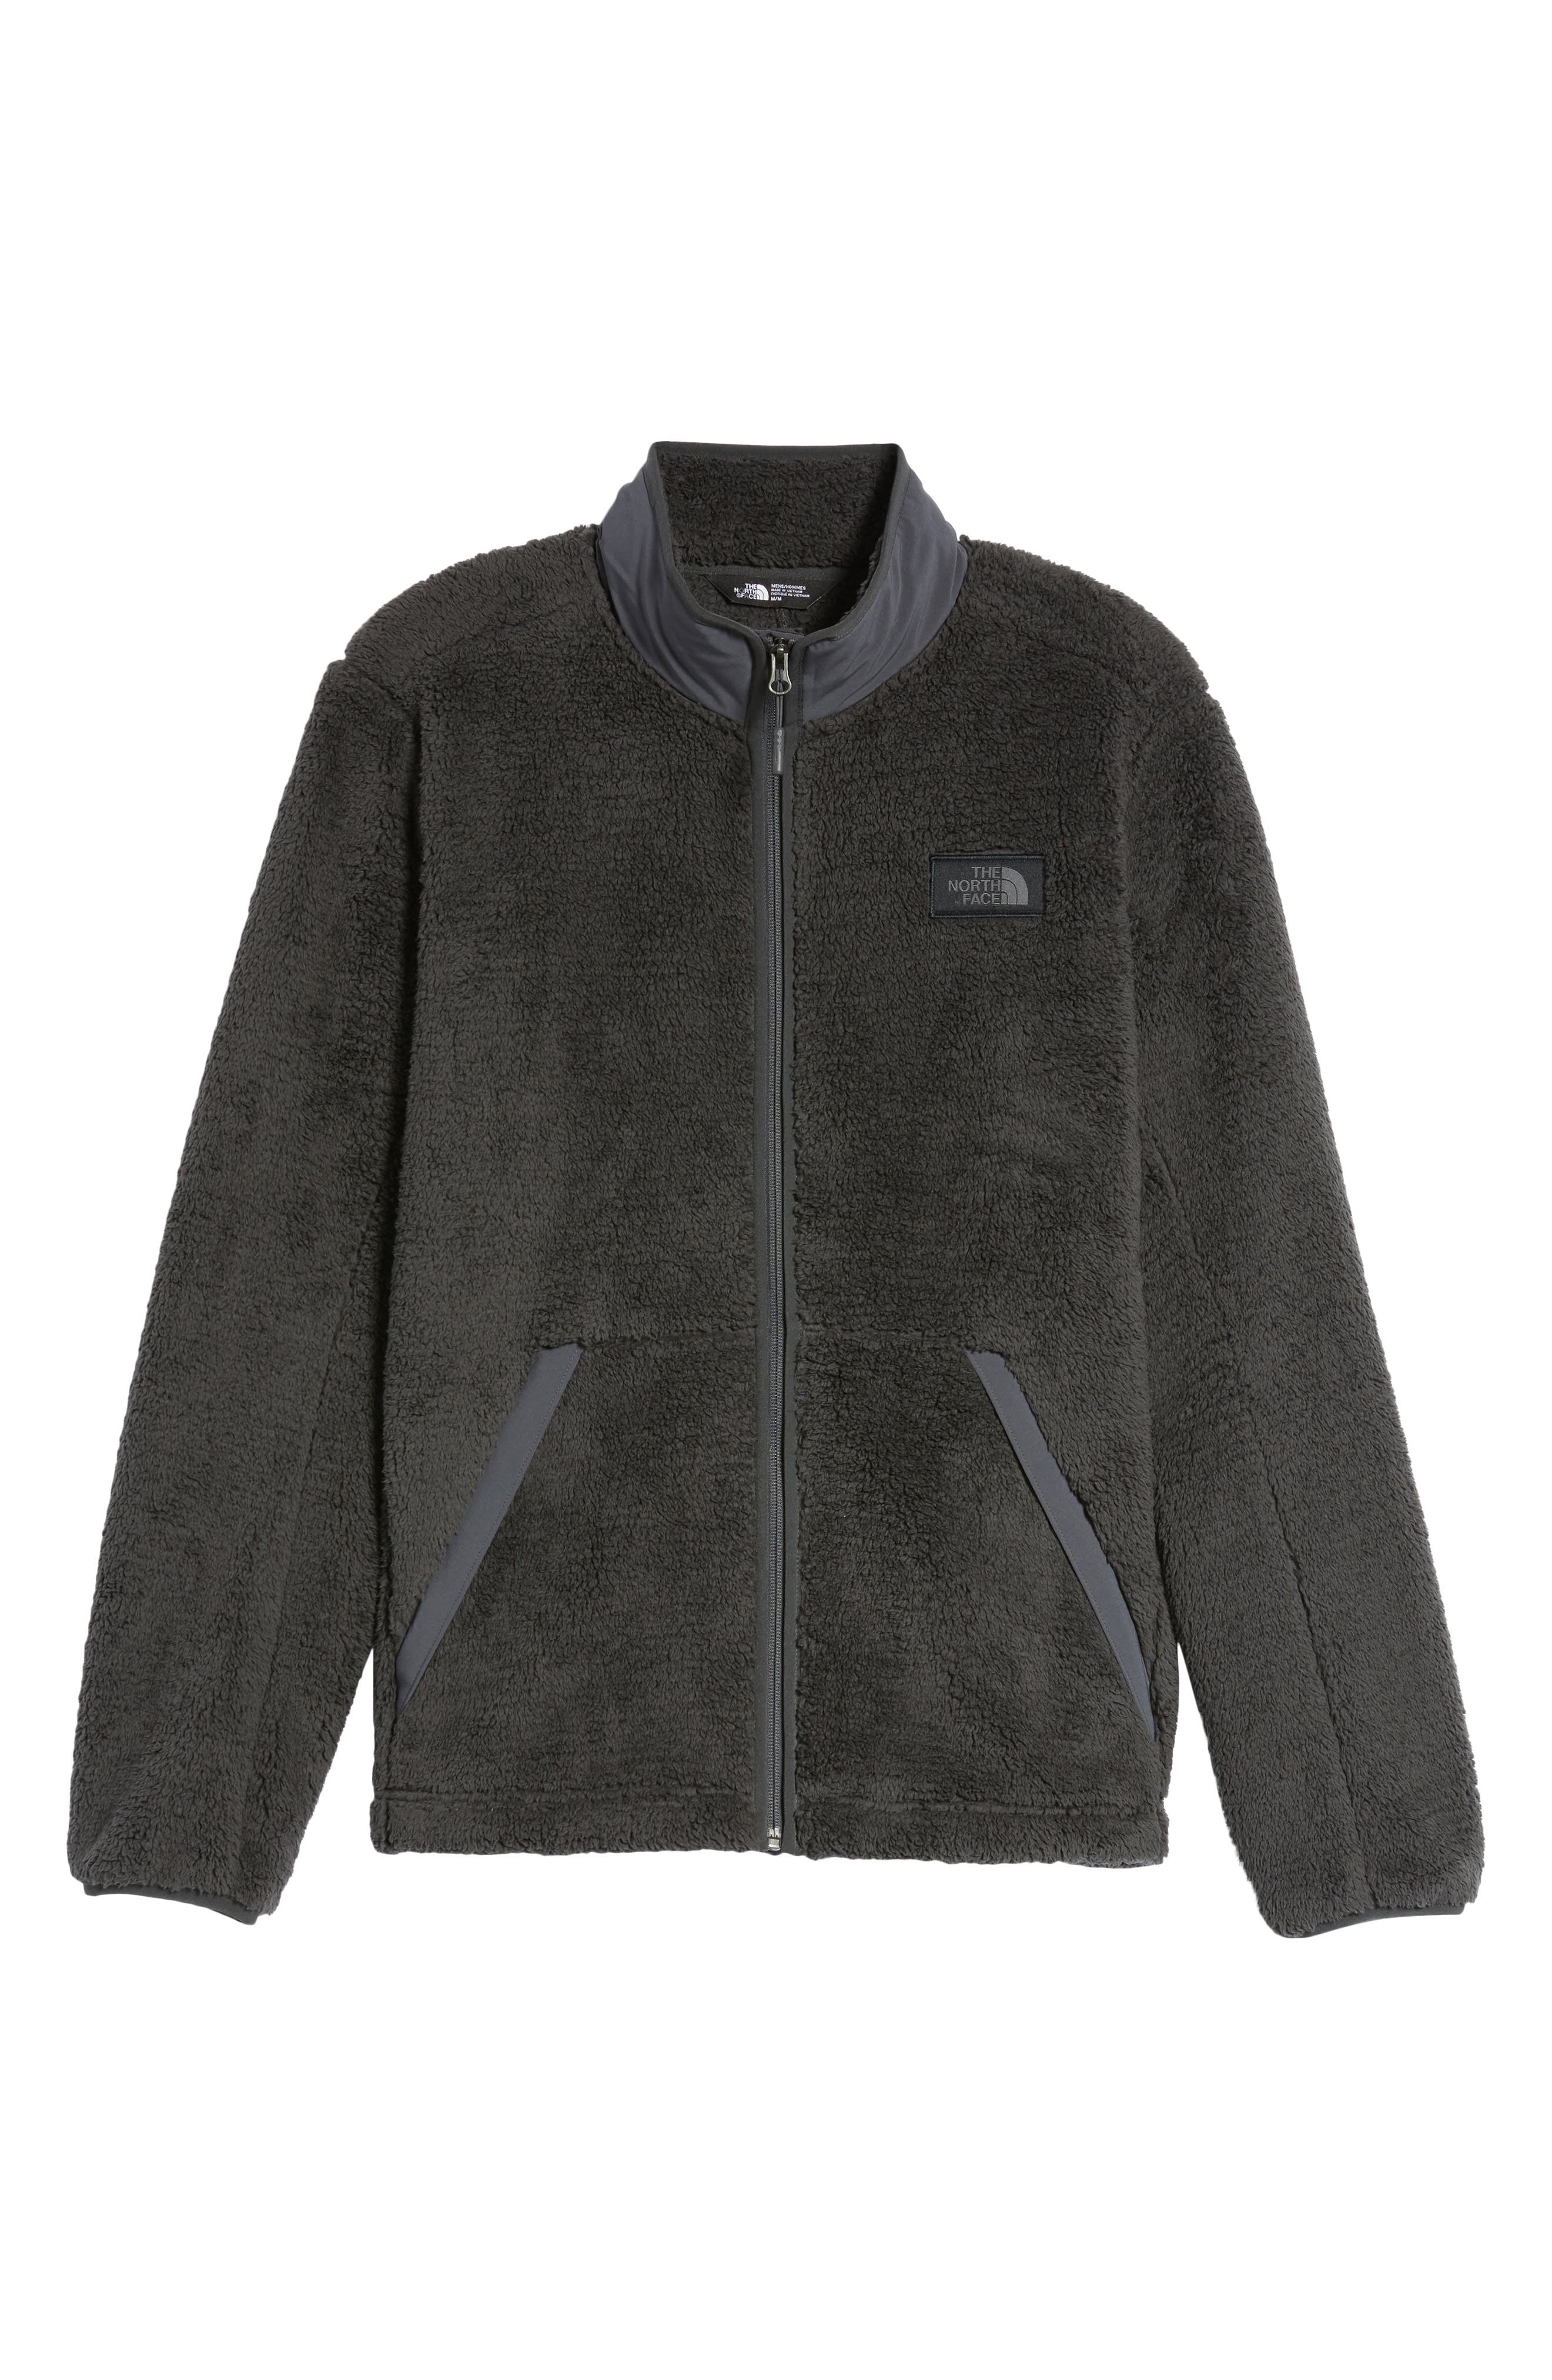 Campshire Zip Fleece Jacket,                             Alternate thumbnail 53, color,